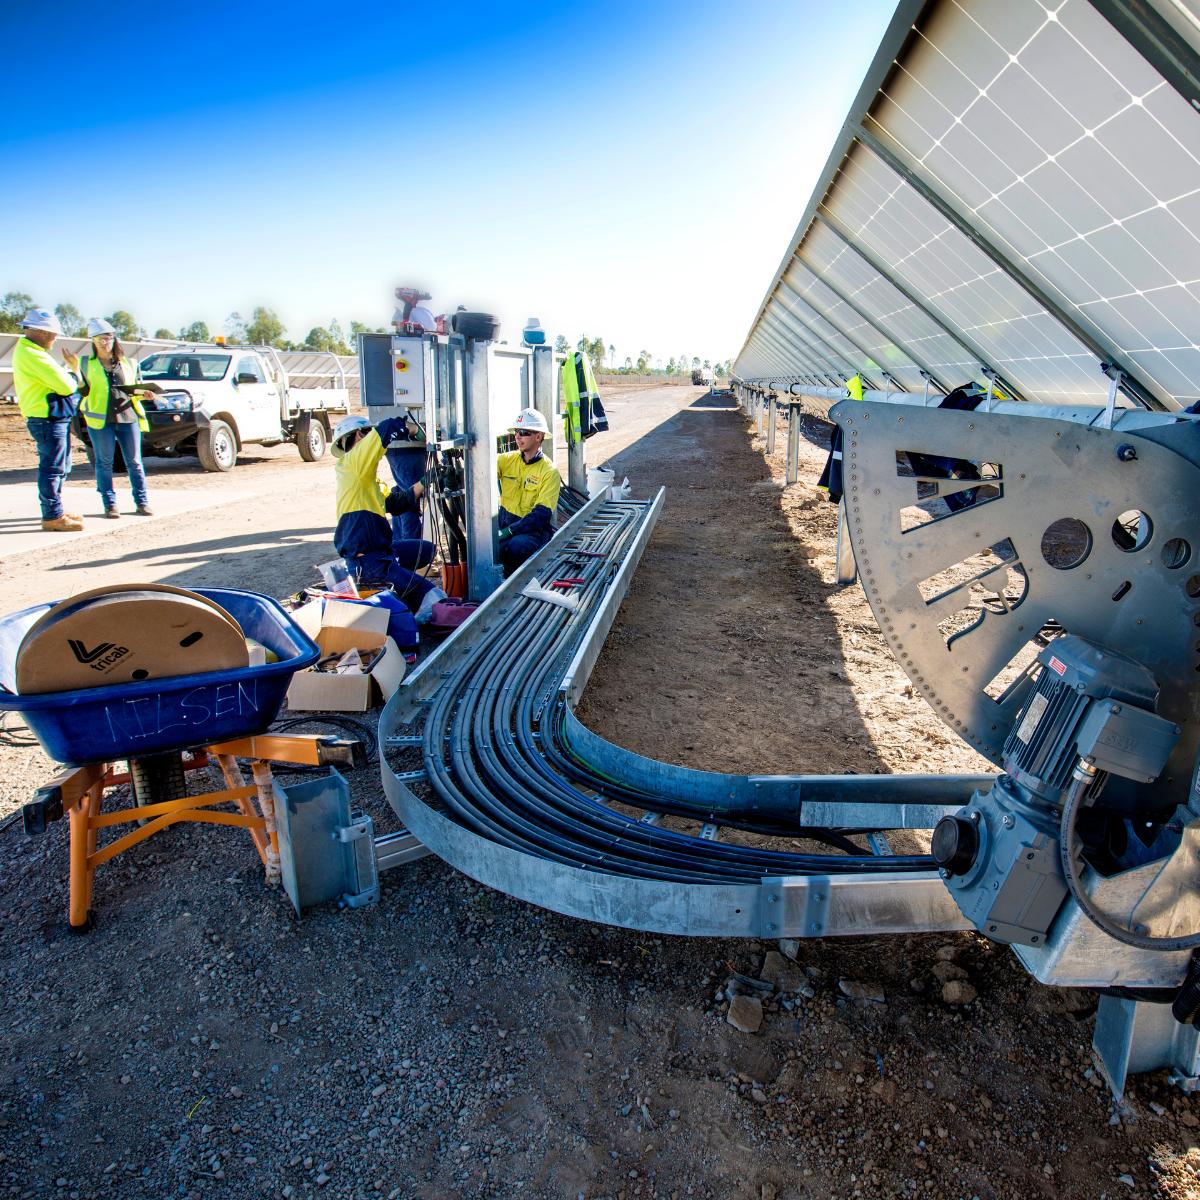 Townsville's Ross River solar farm